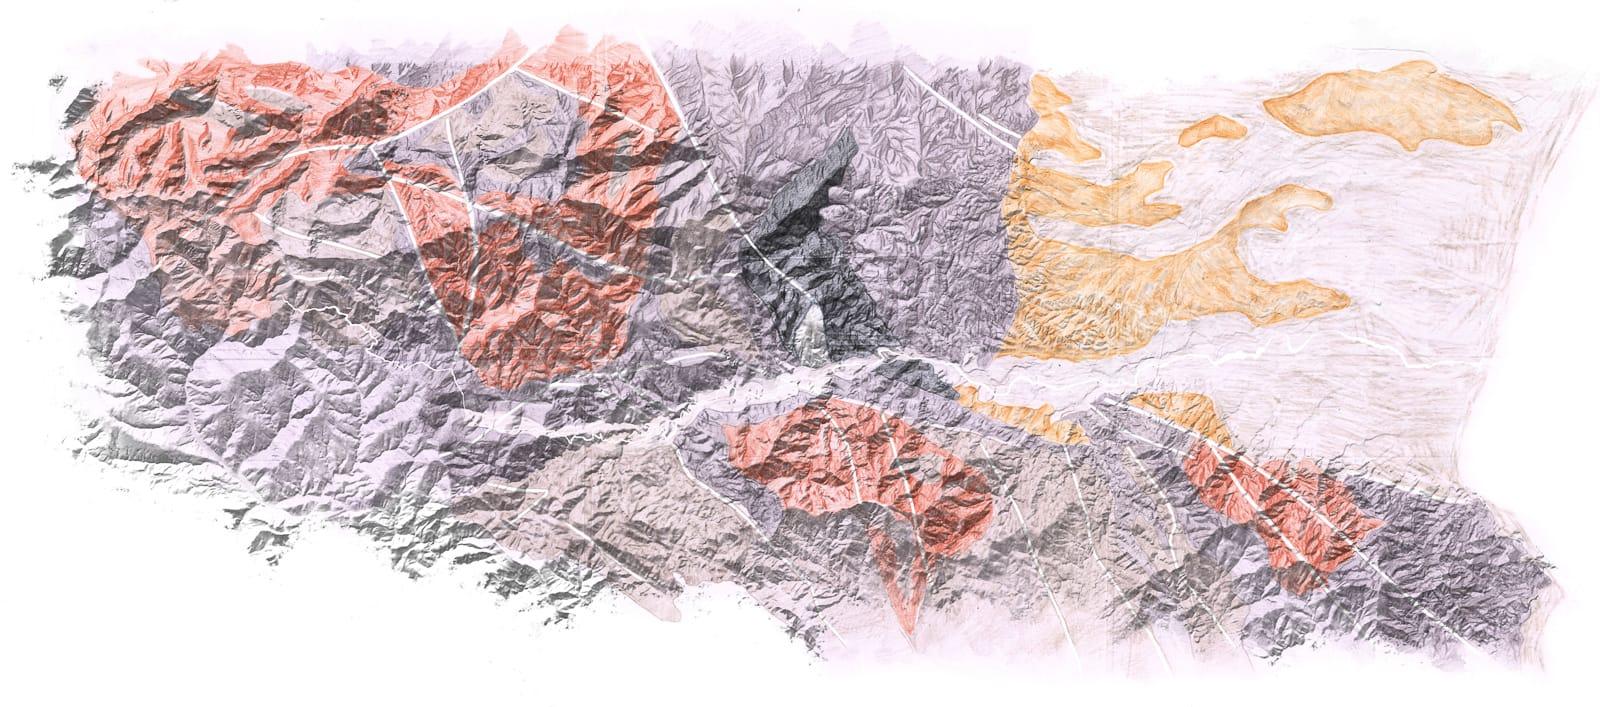 etude vallee du tech carte topographie géologie ®HermelineCarpentier